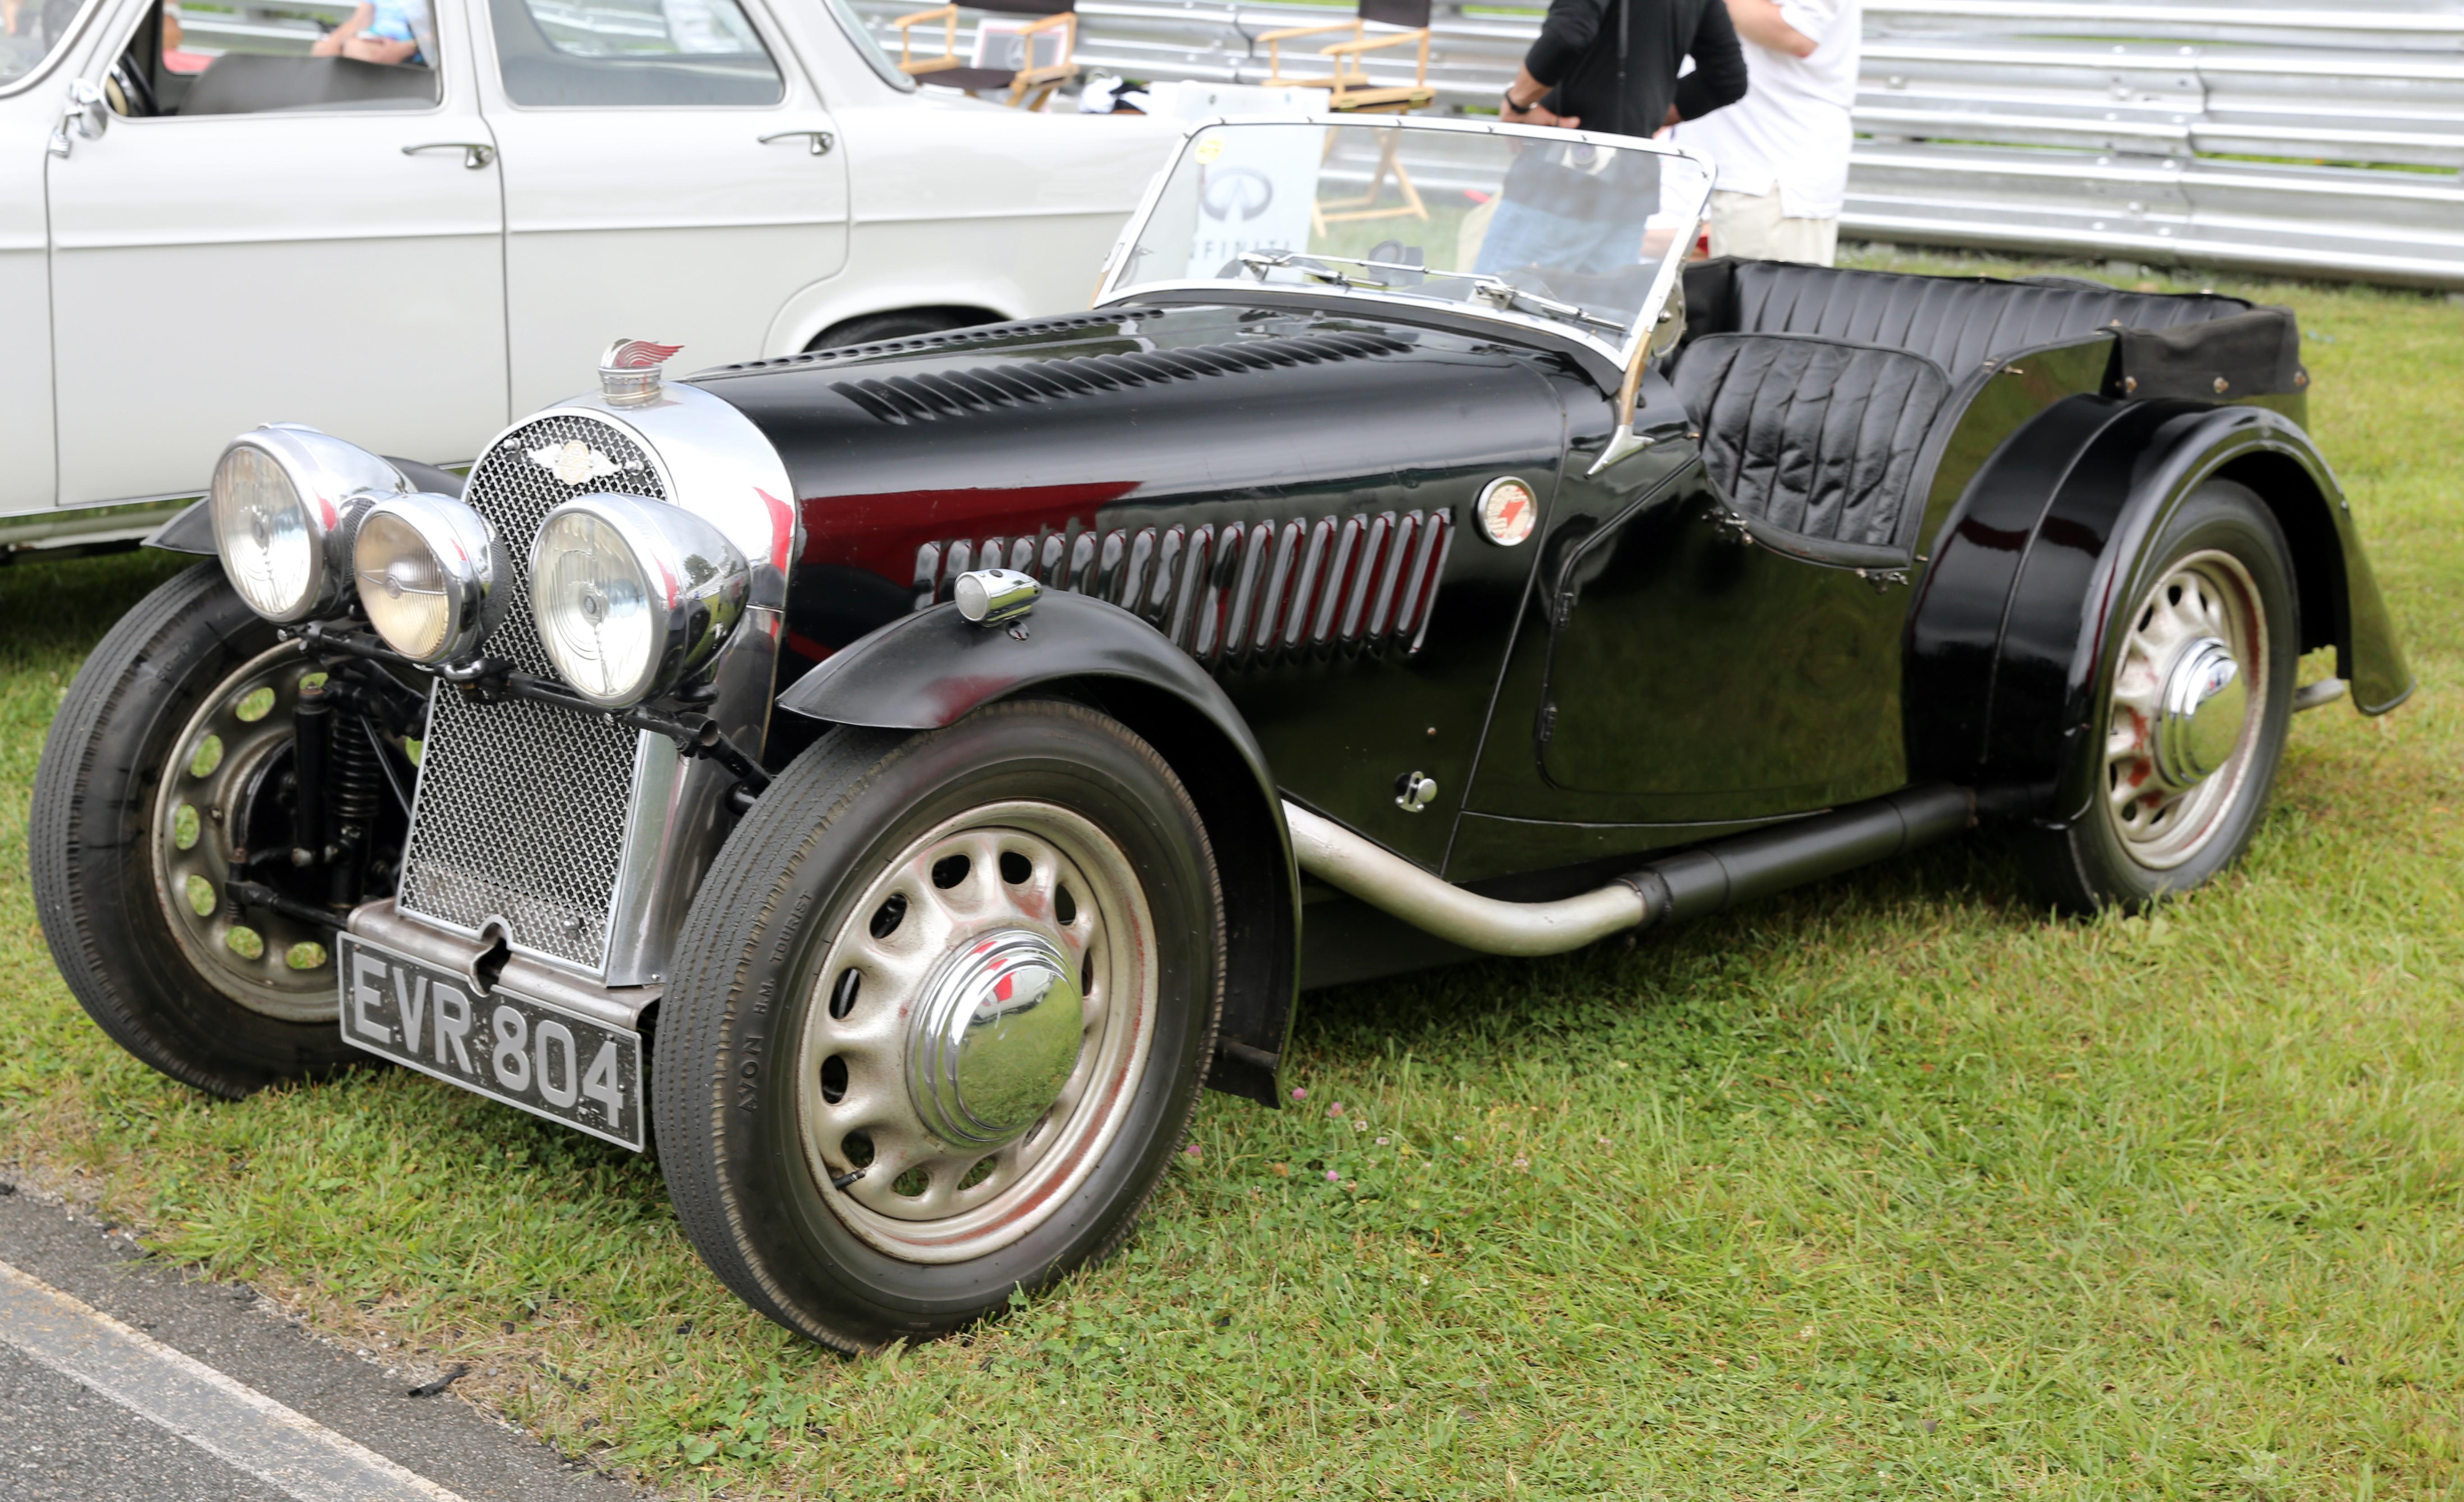 file 1938 morgan 4 4 le mans replica four seater wikimedia commons. Black Bedroom Furniture Sets. Home Design Ideas